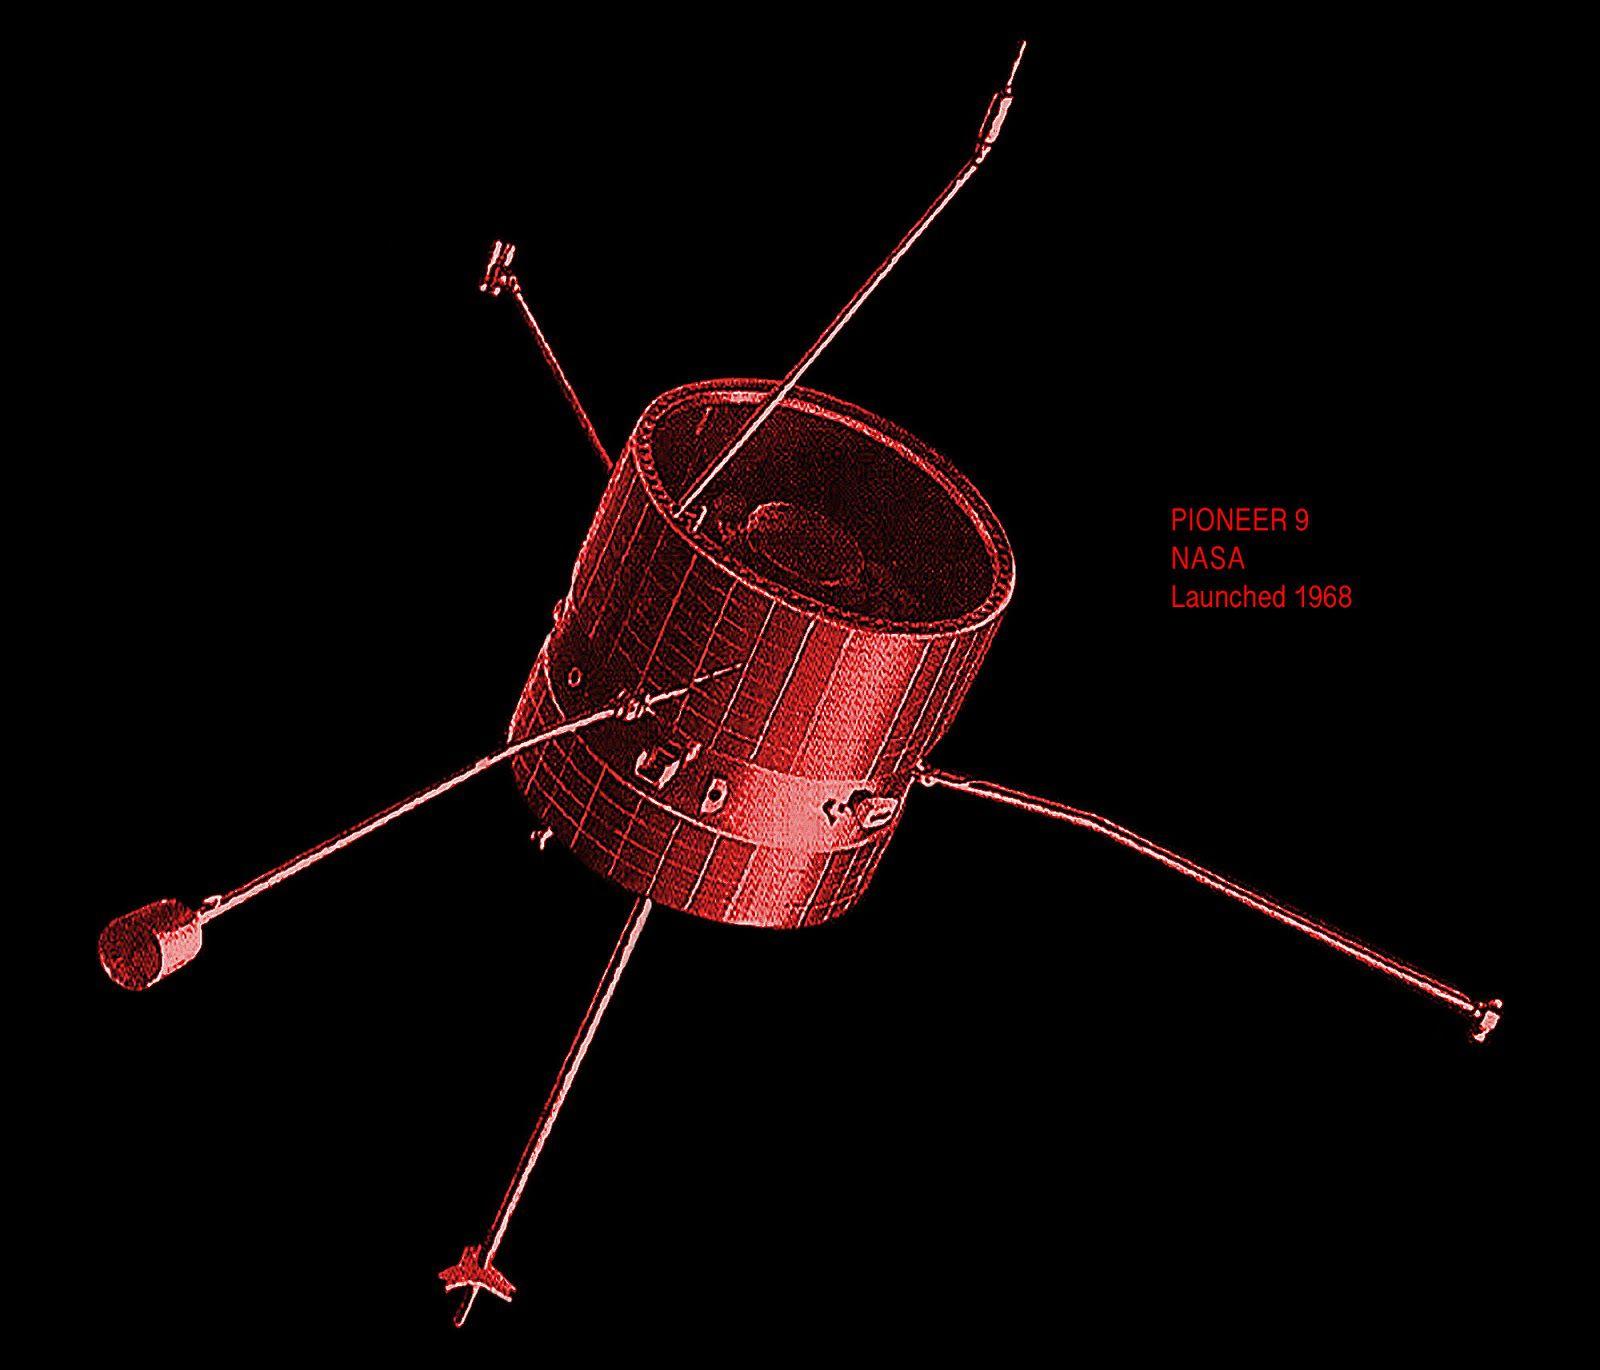 An illustration of Pioneer 9.